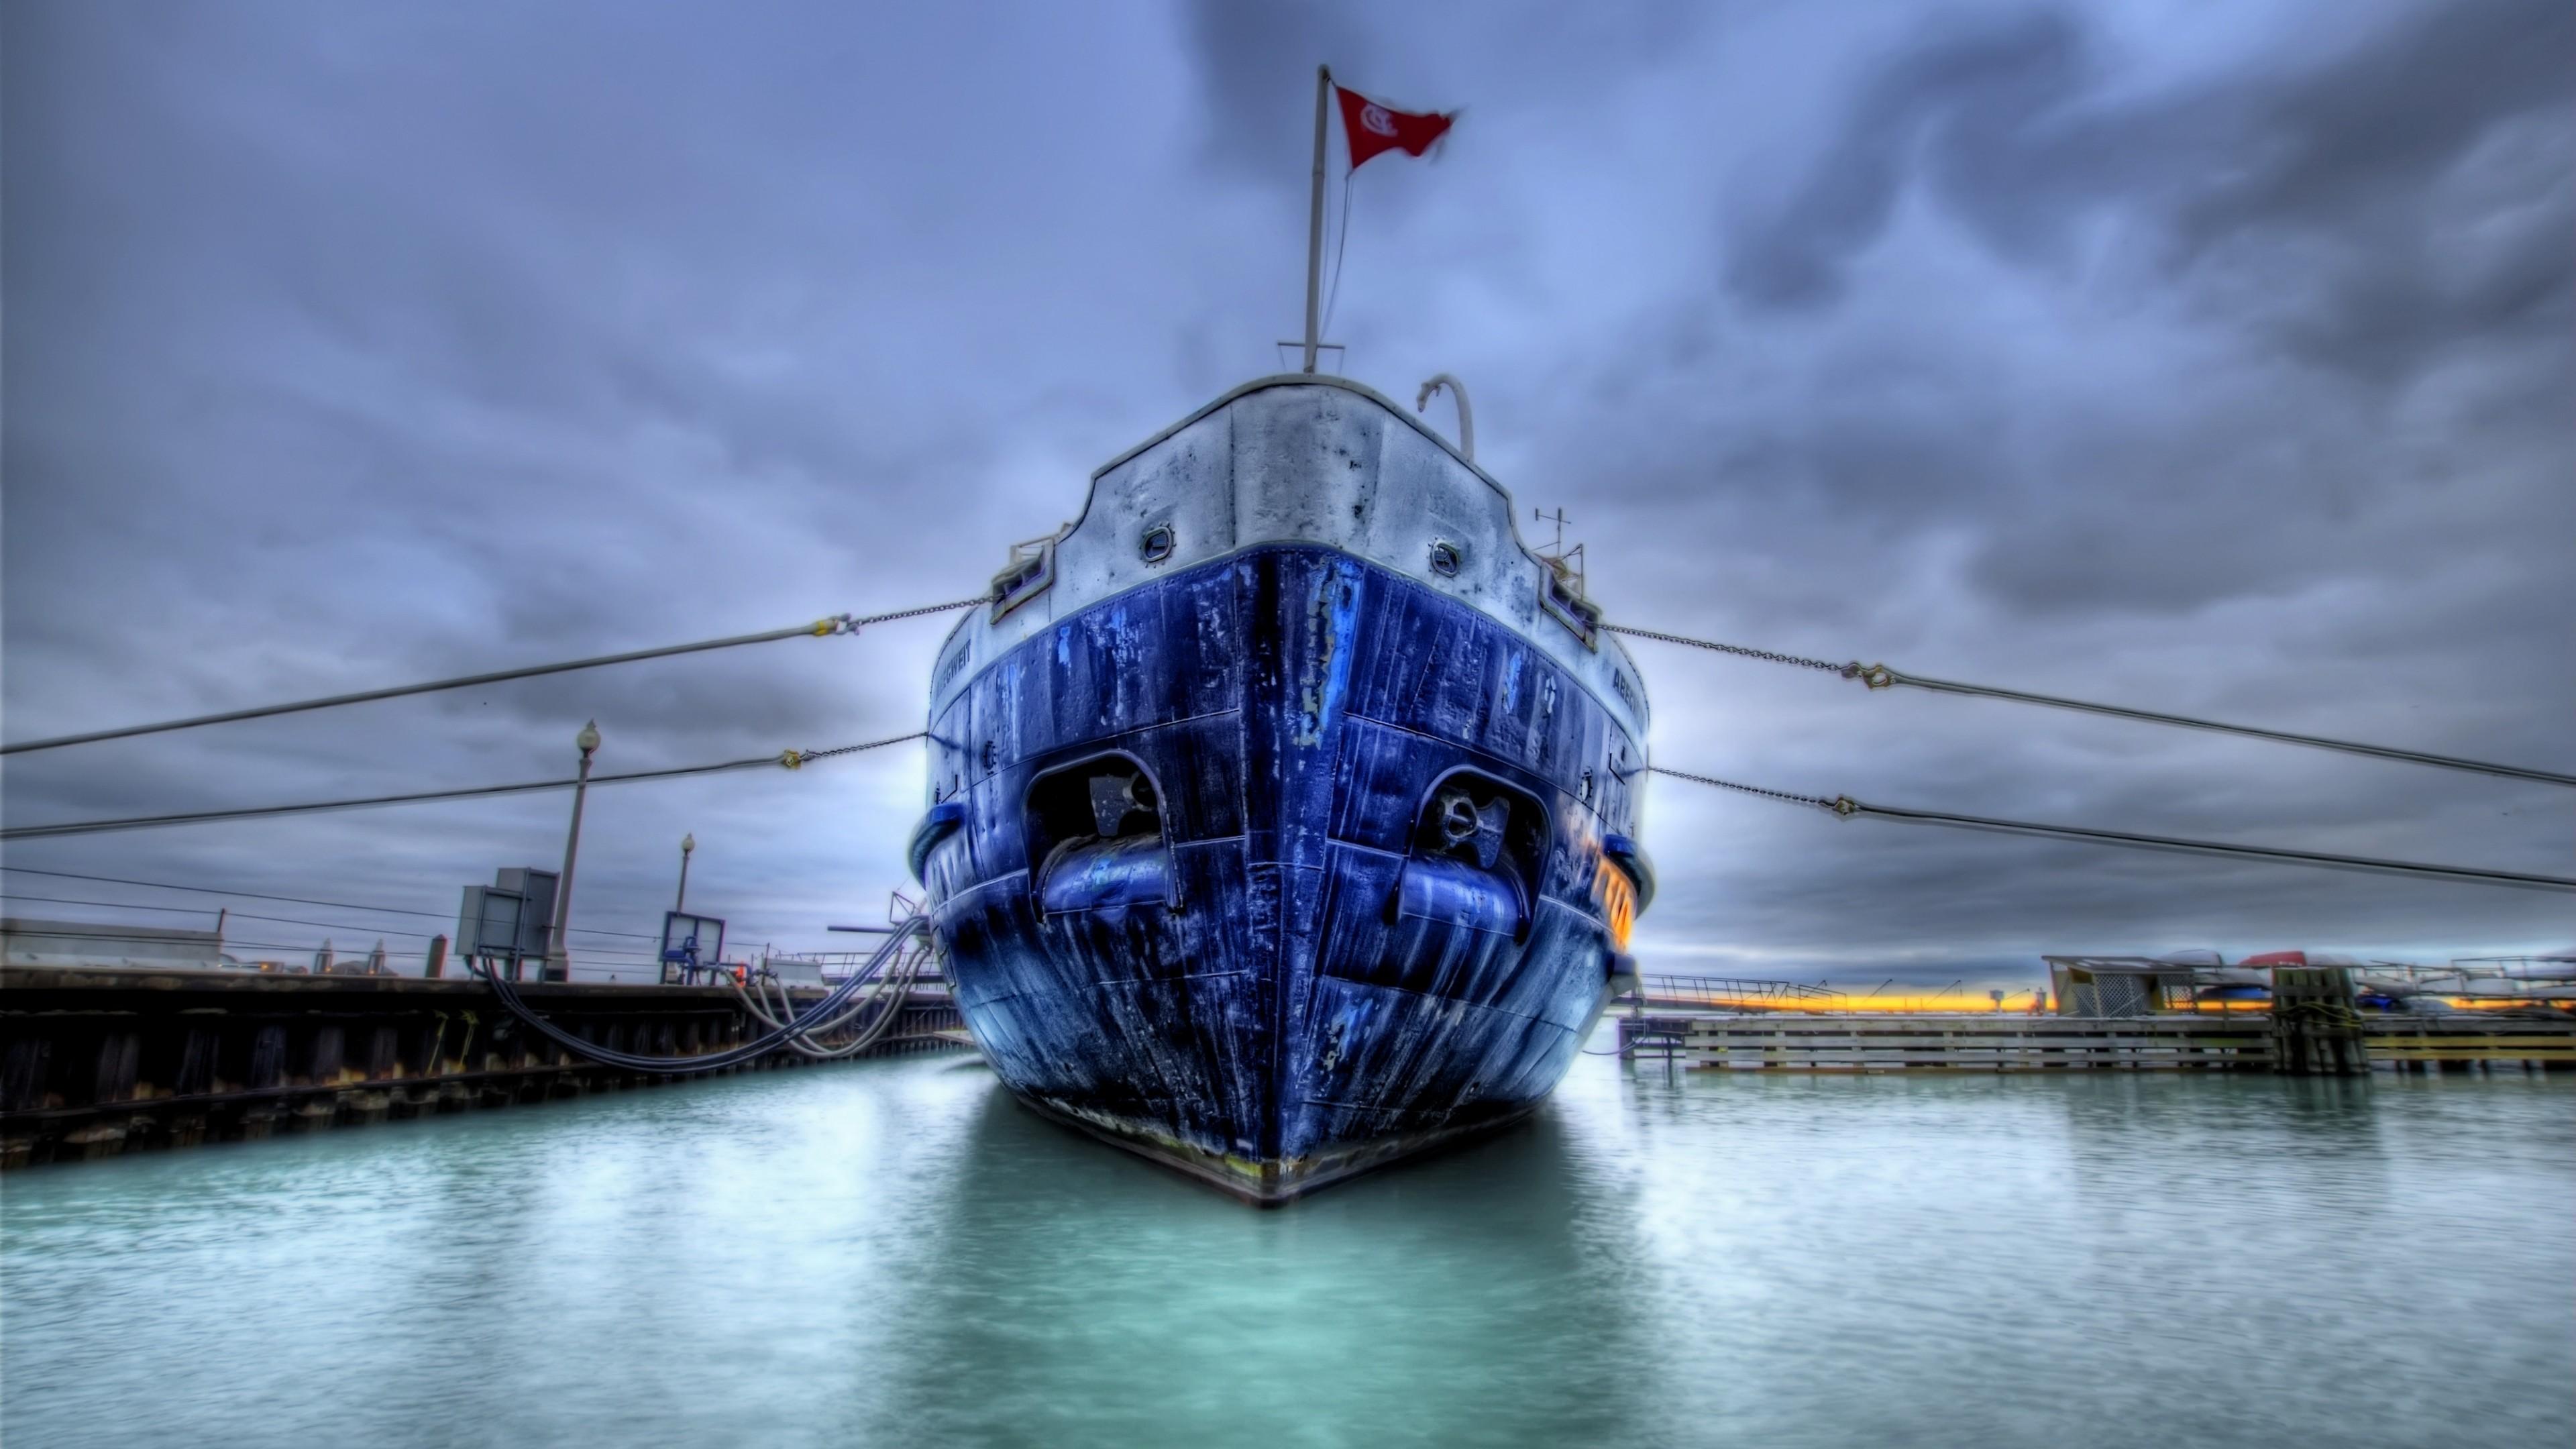 Wallpaper boat, ship, dock, sea, flag, hdr